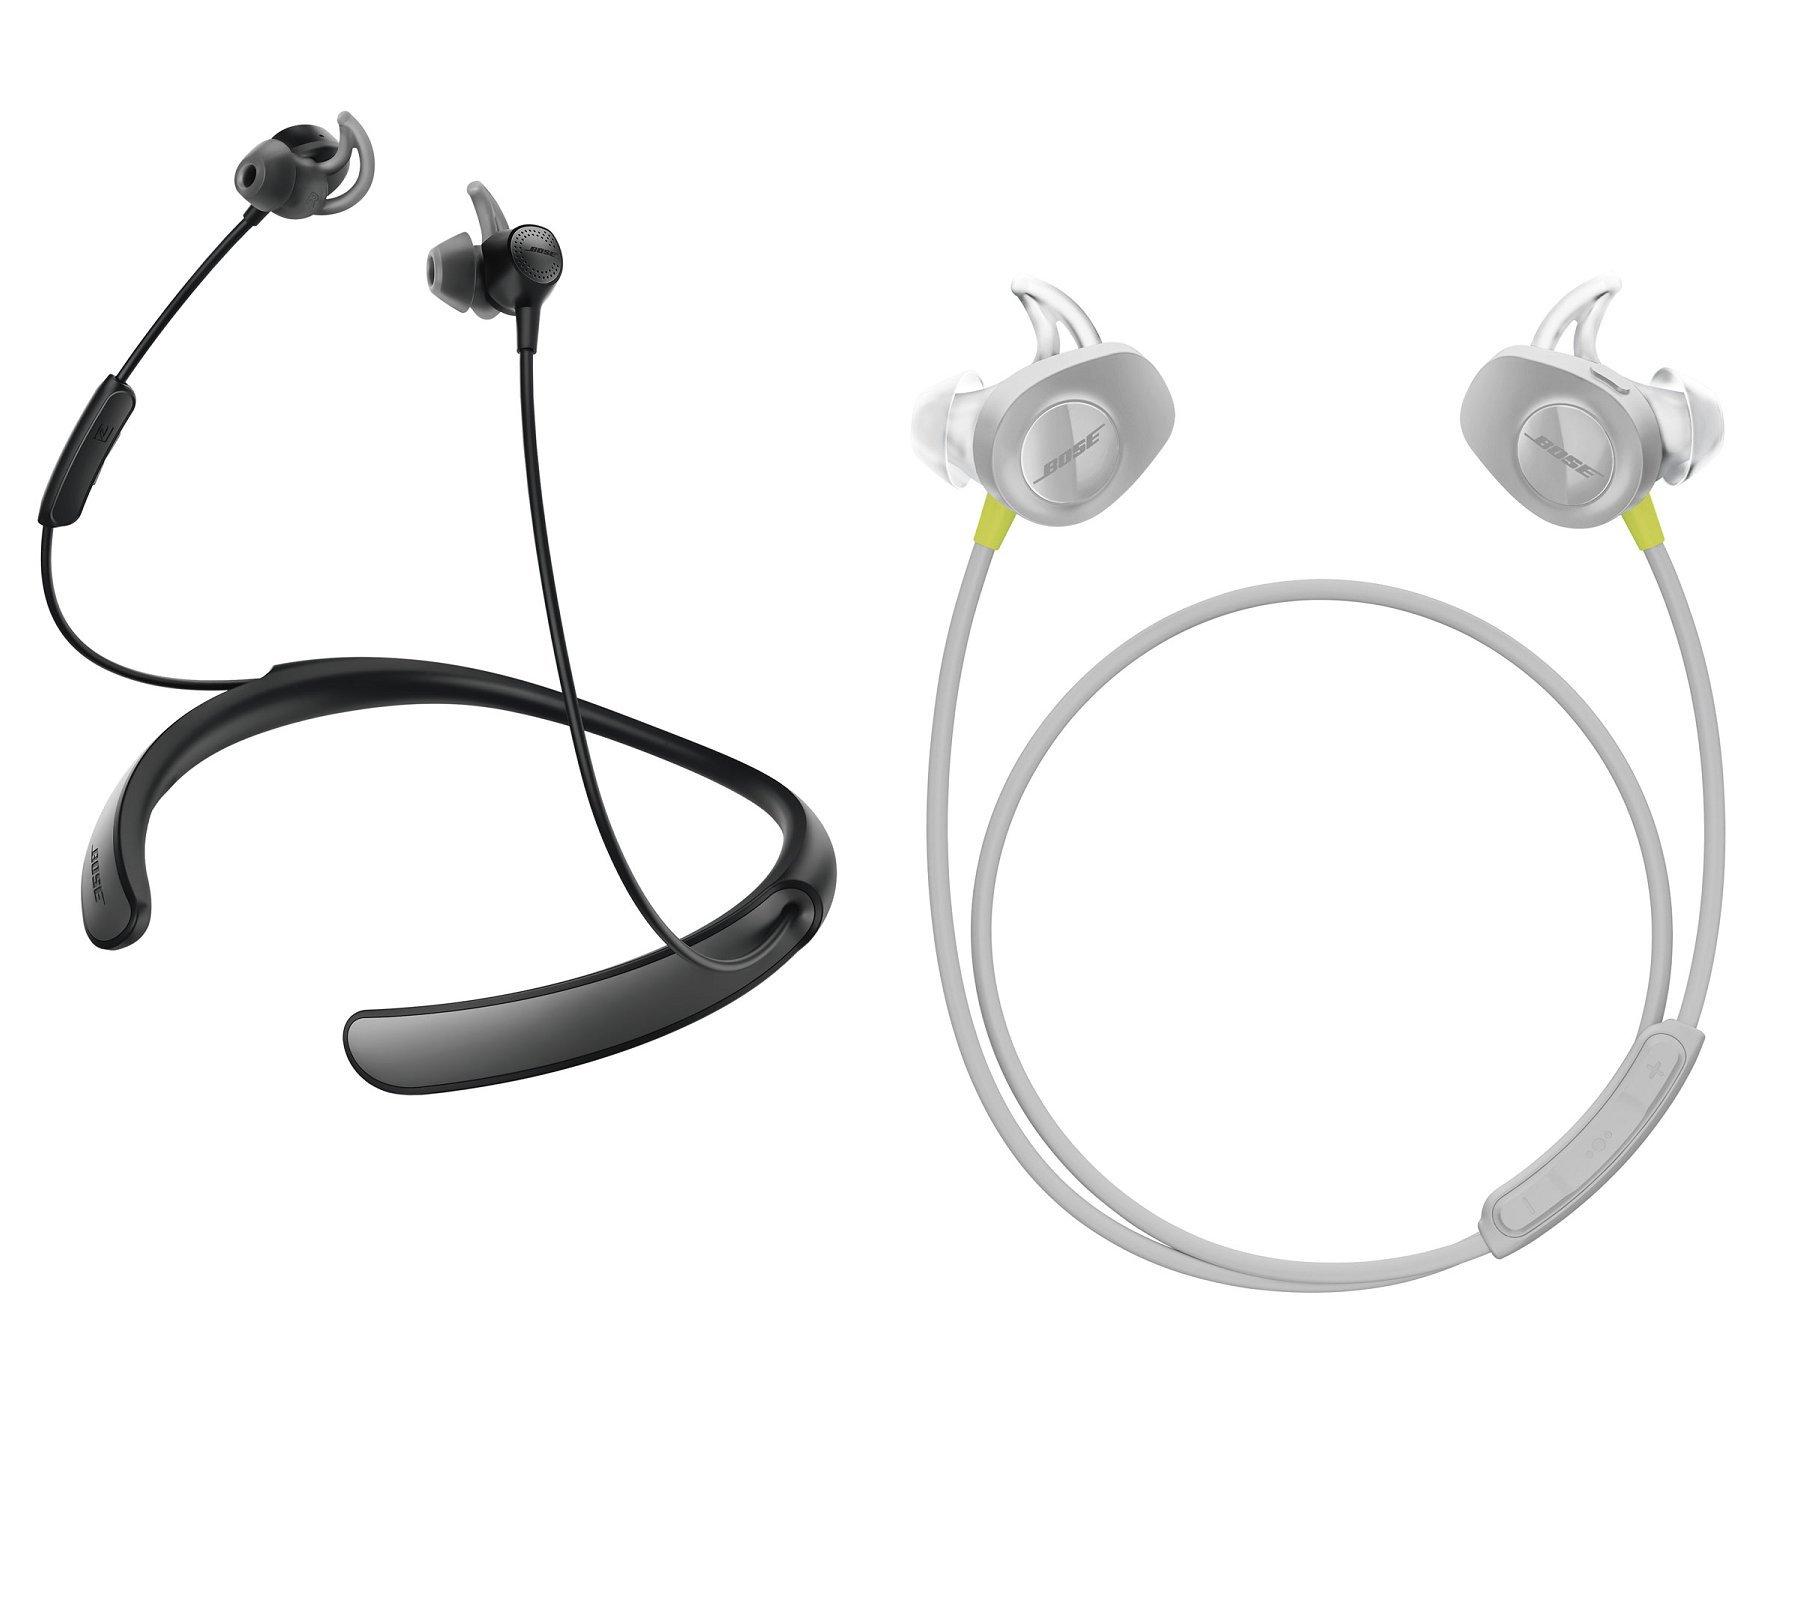 Bose Bluetooth Headphone Bundle - SoundSport Wireless Citron & QuietControl 30 Black In-ear Headphones